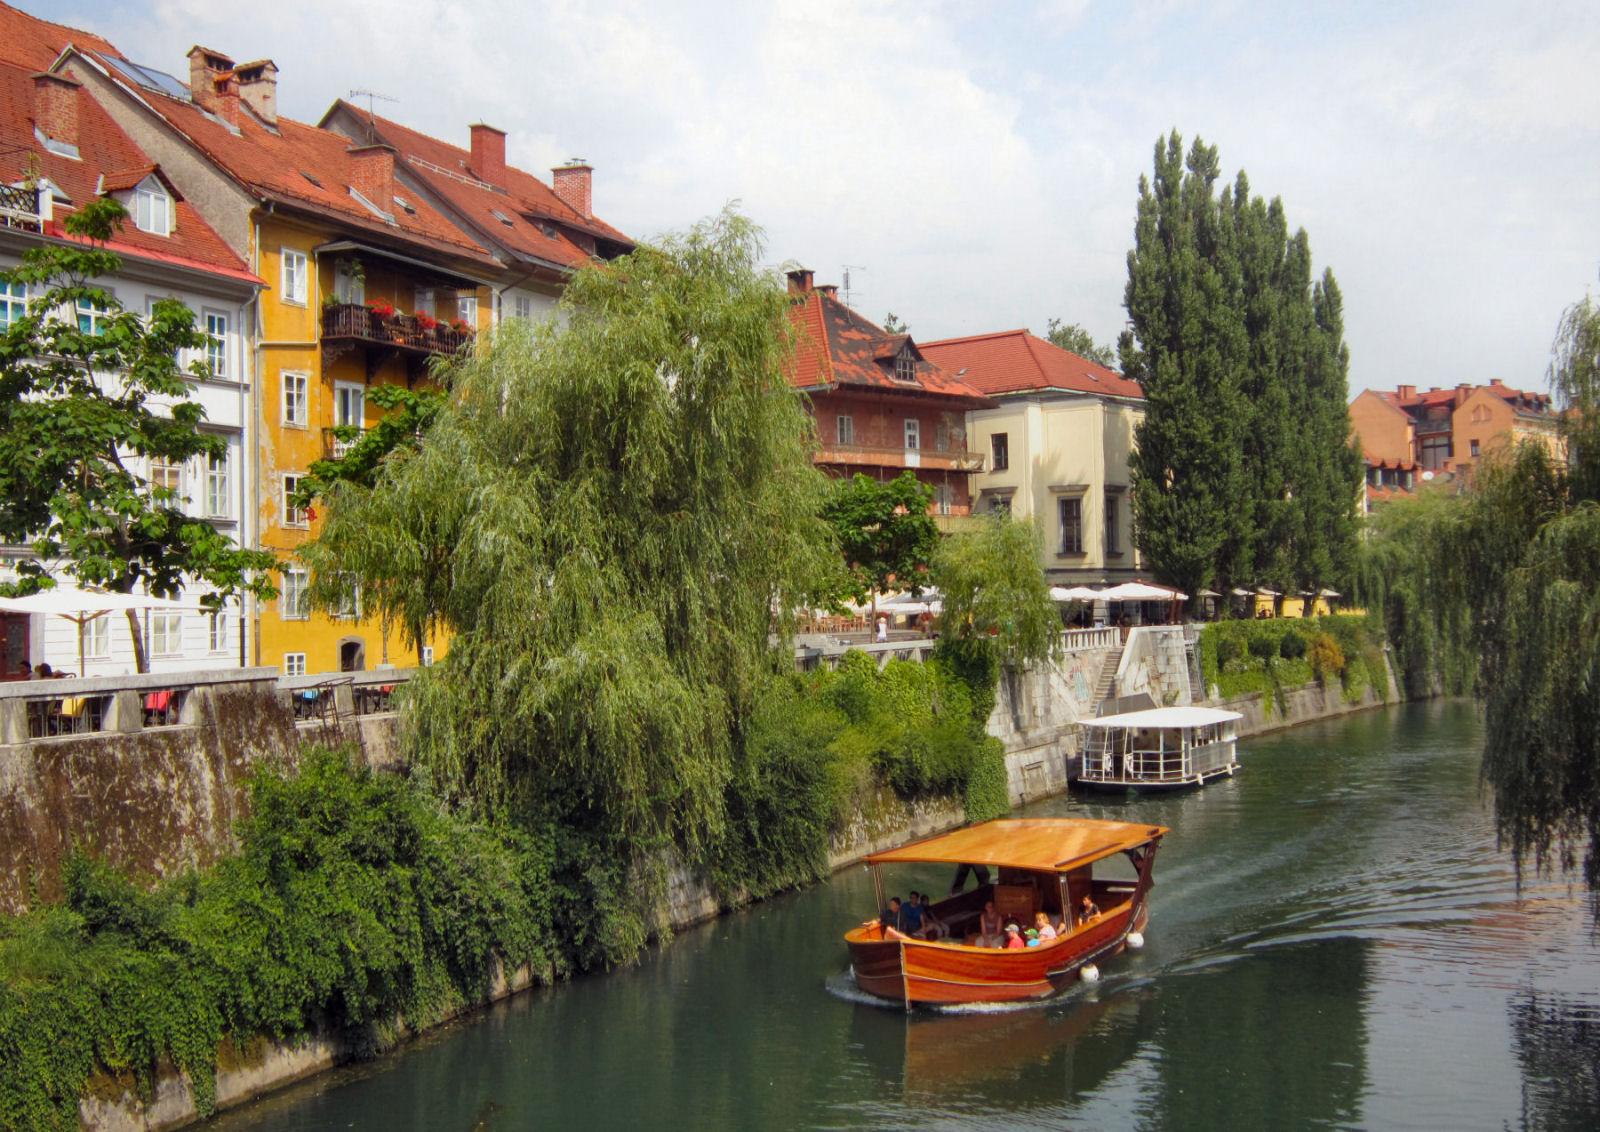 Ljubljanica River Canal tourist boats